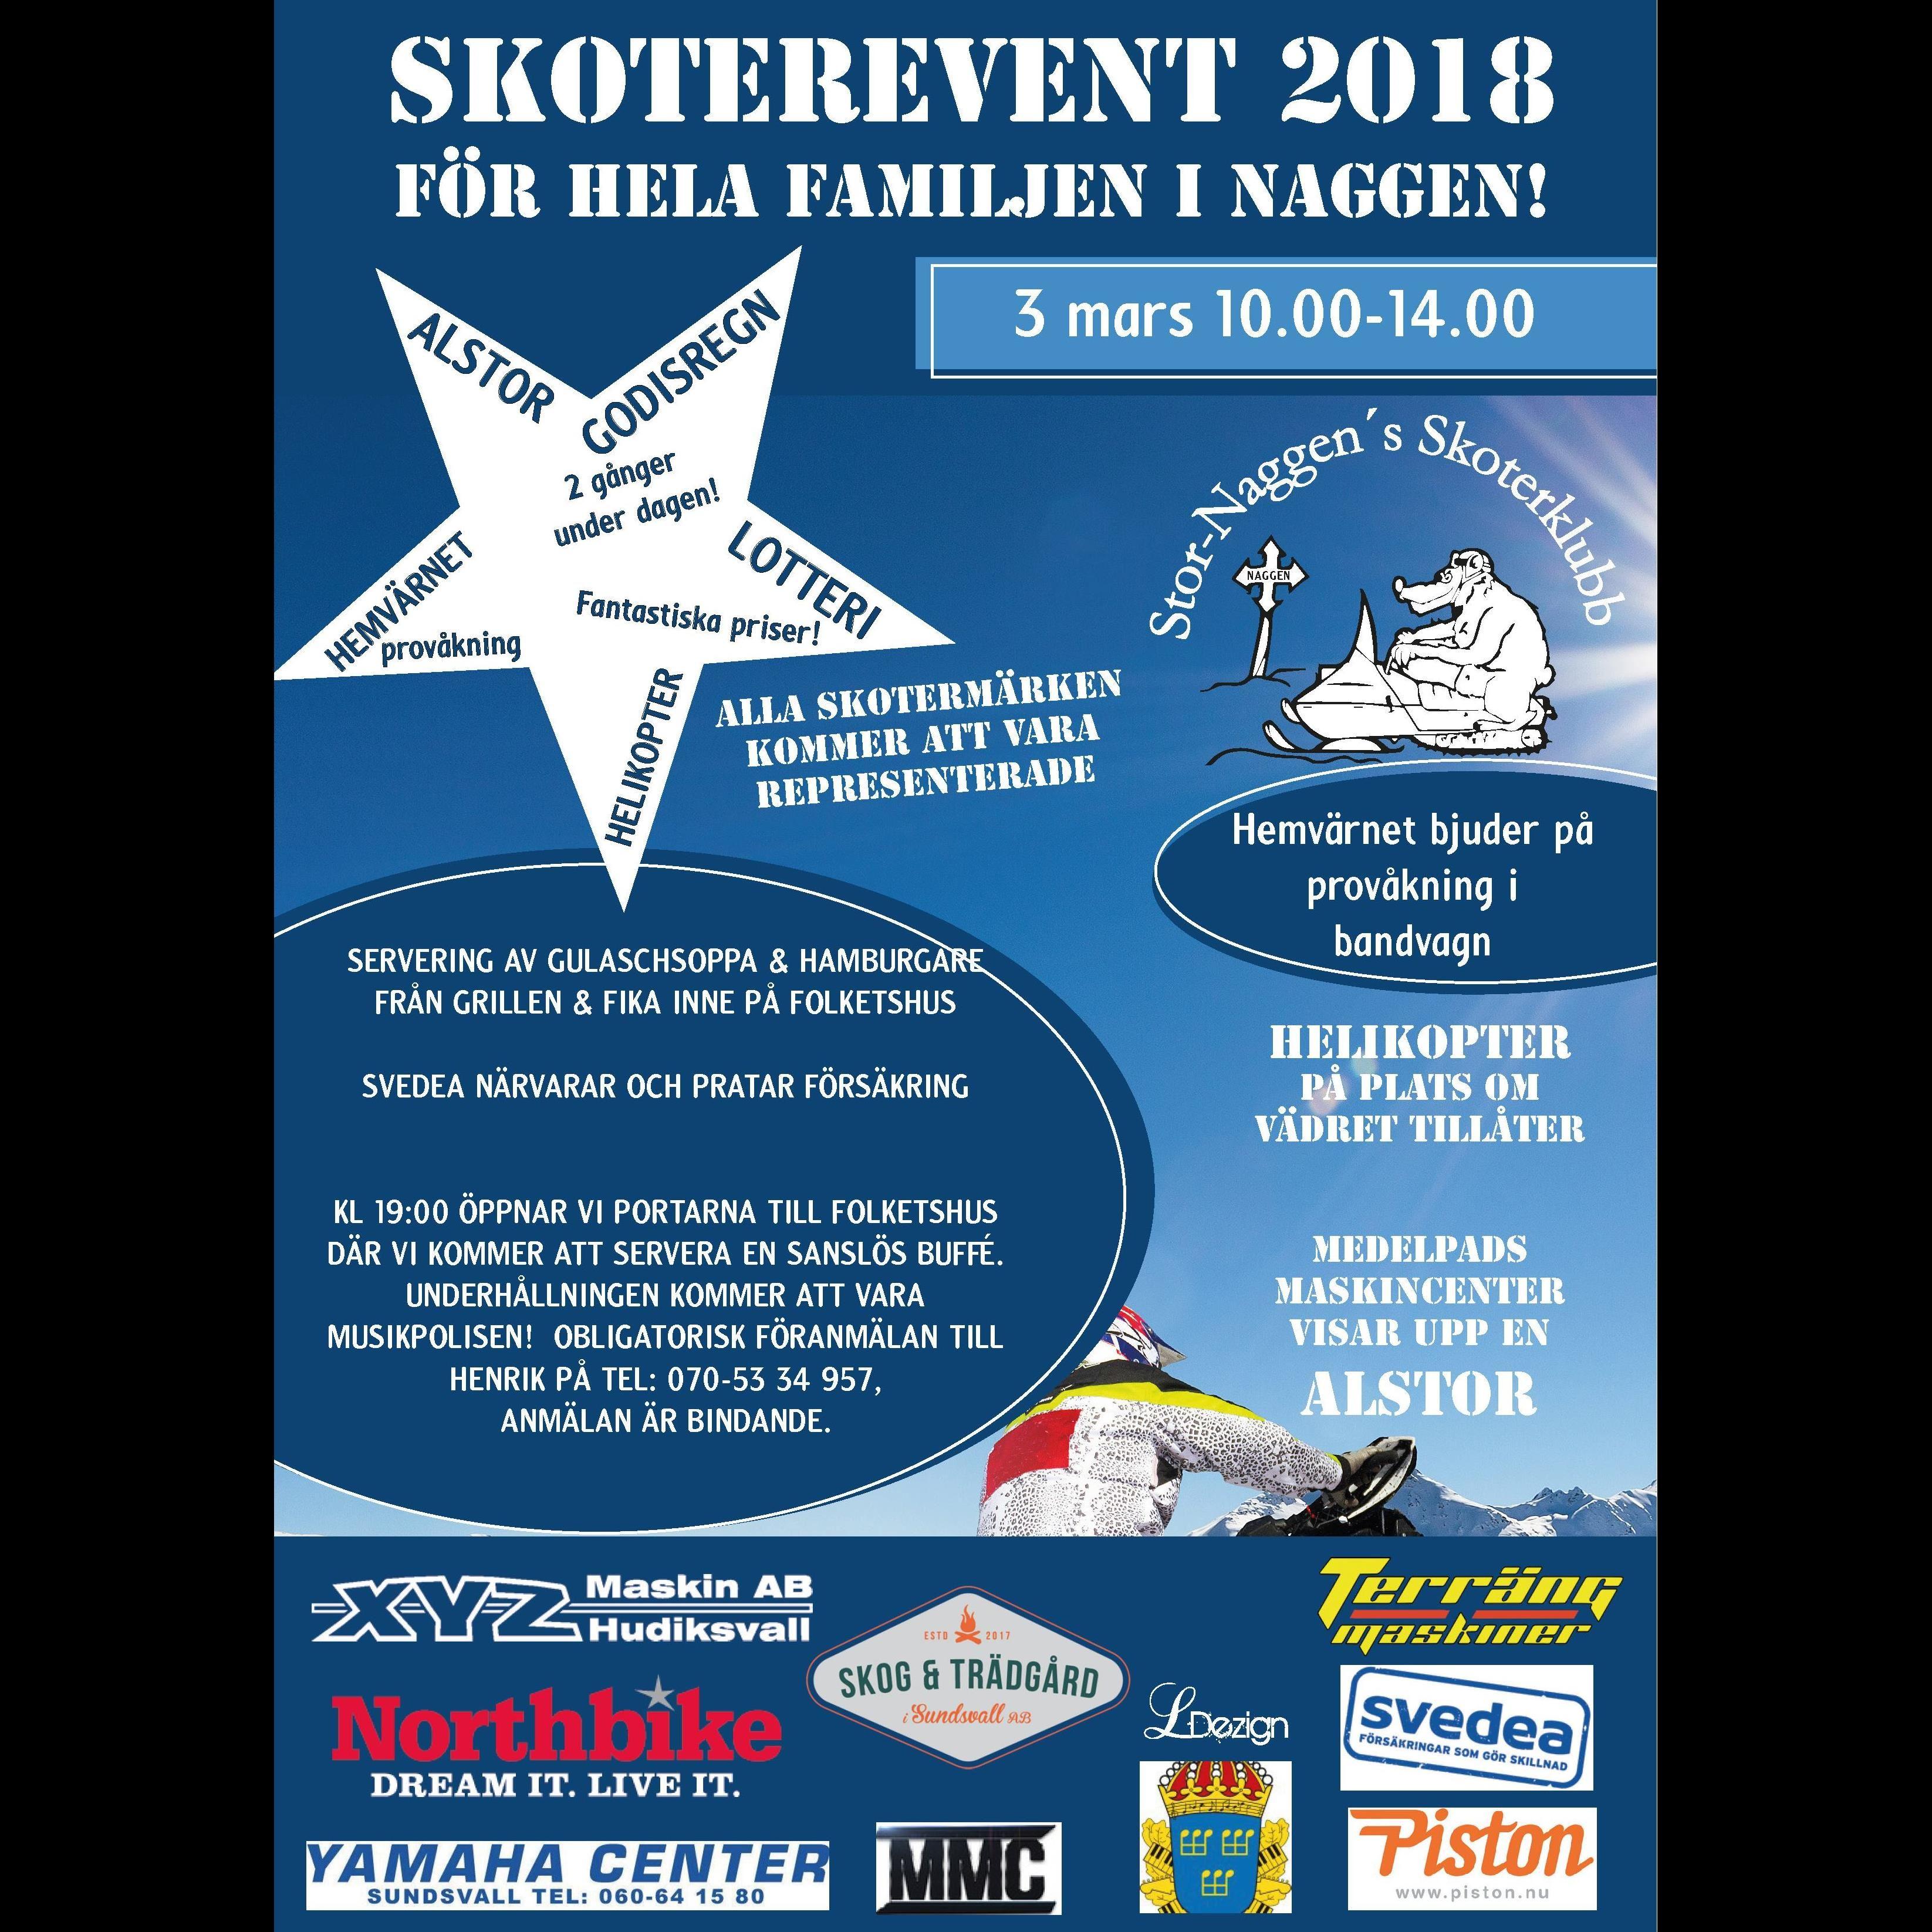 Skoterevent 2018, Naggen